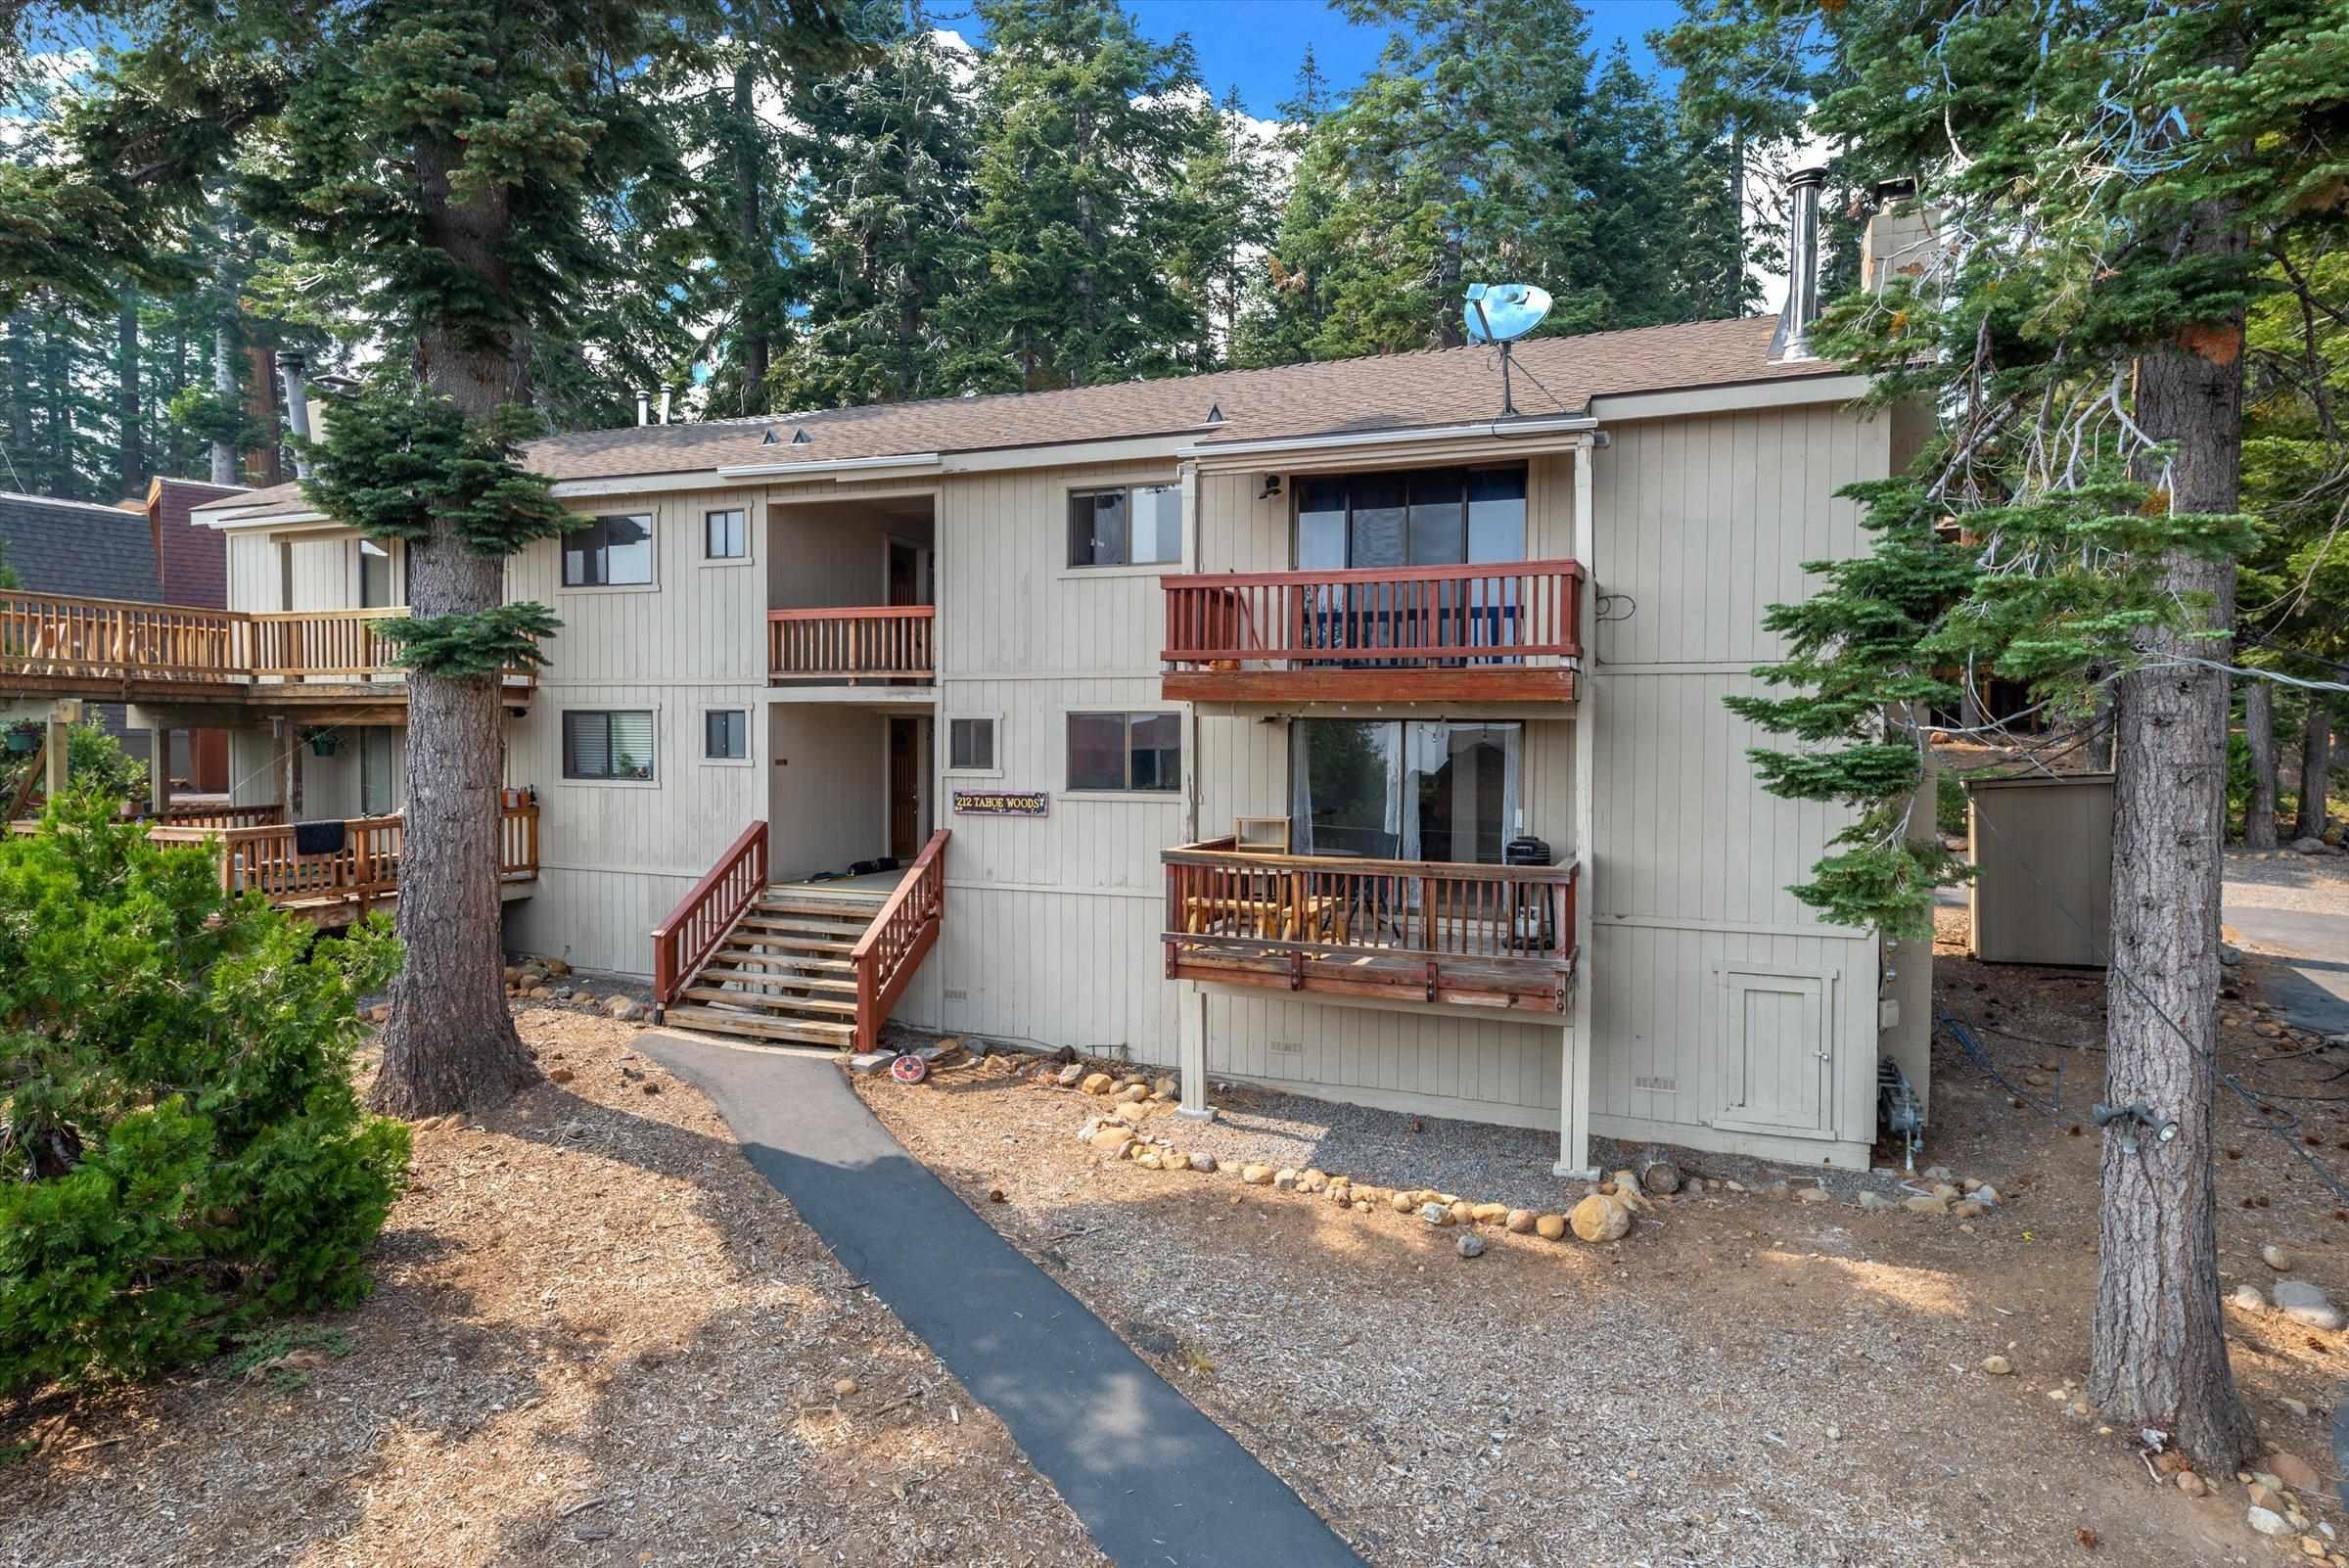 Image for 280 Tahoe Woods Blvd, Tahoe City, CA 96145